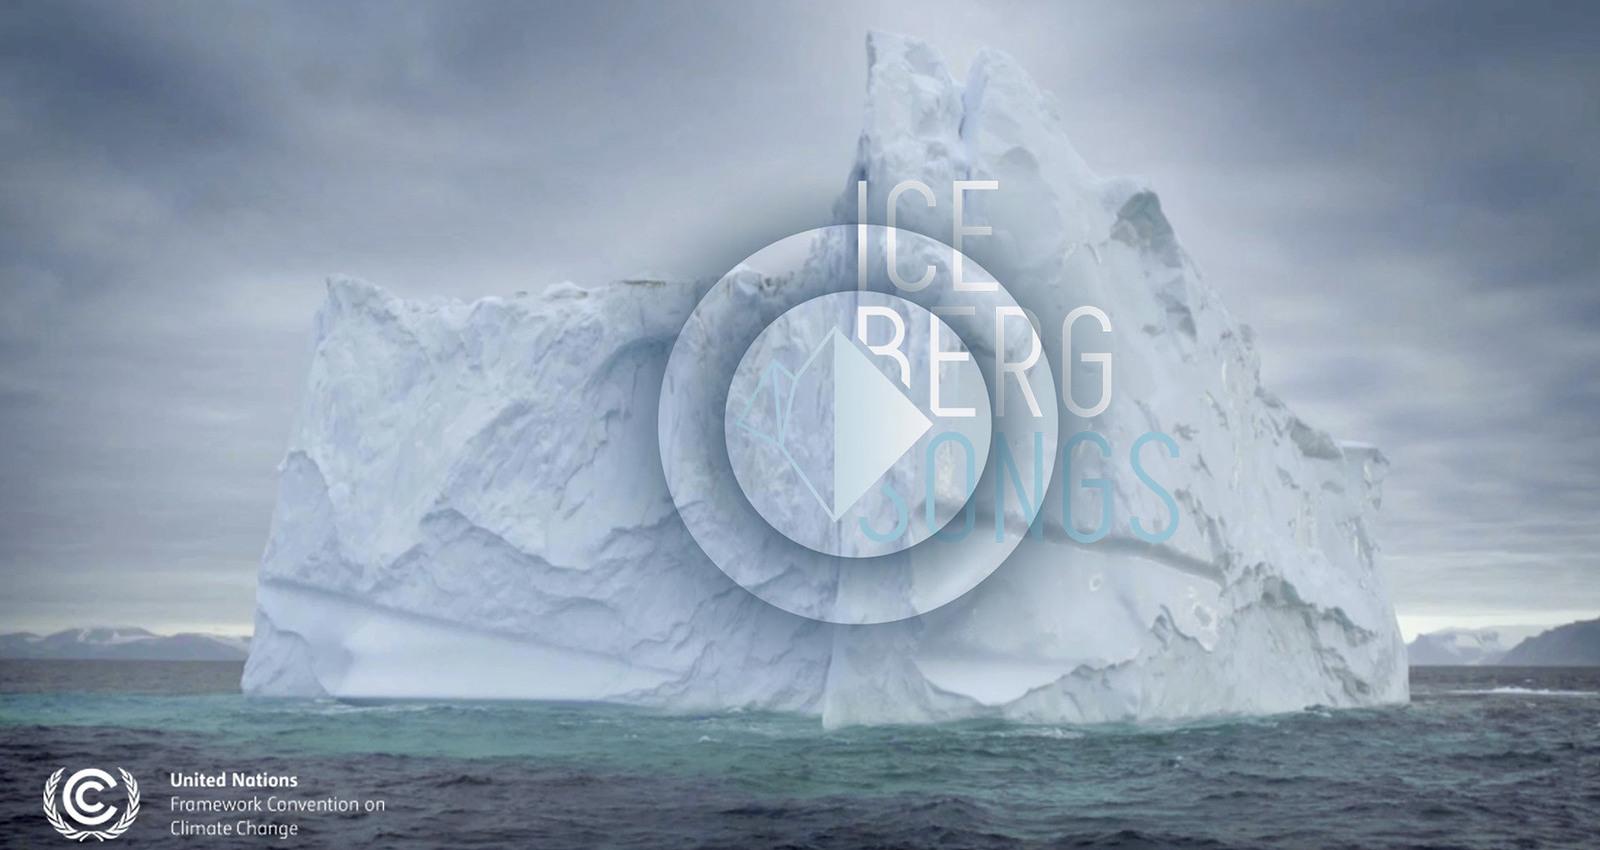 Iceberg Songs